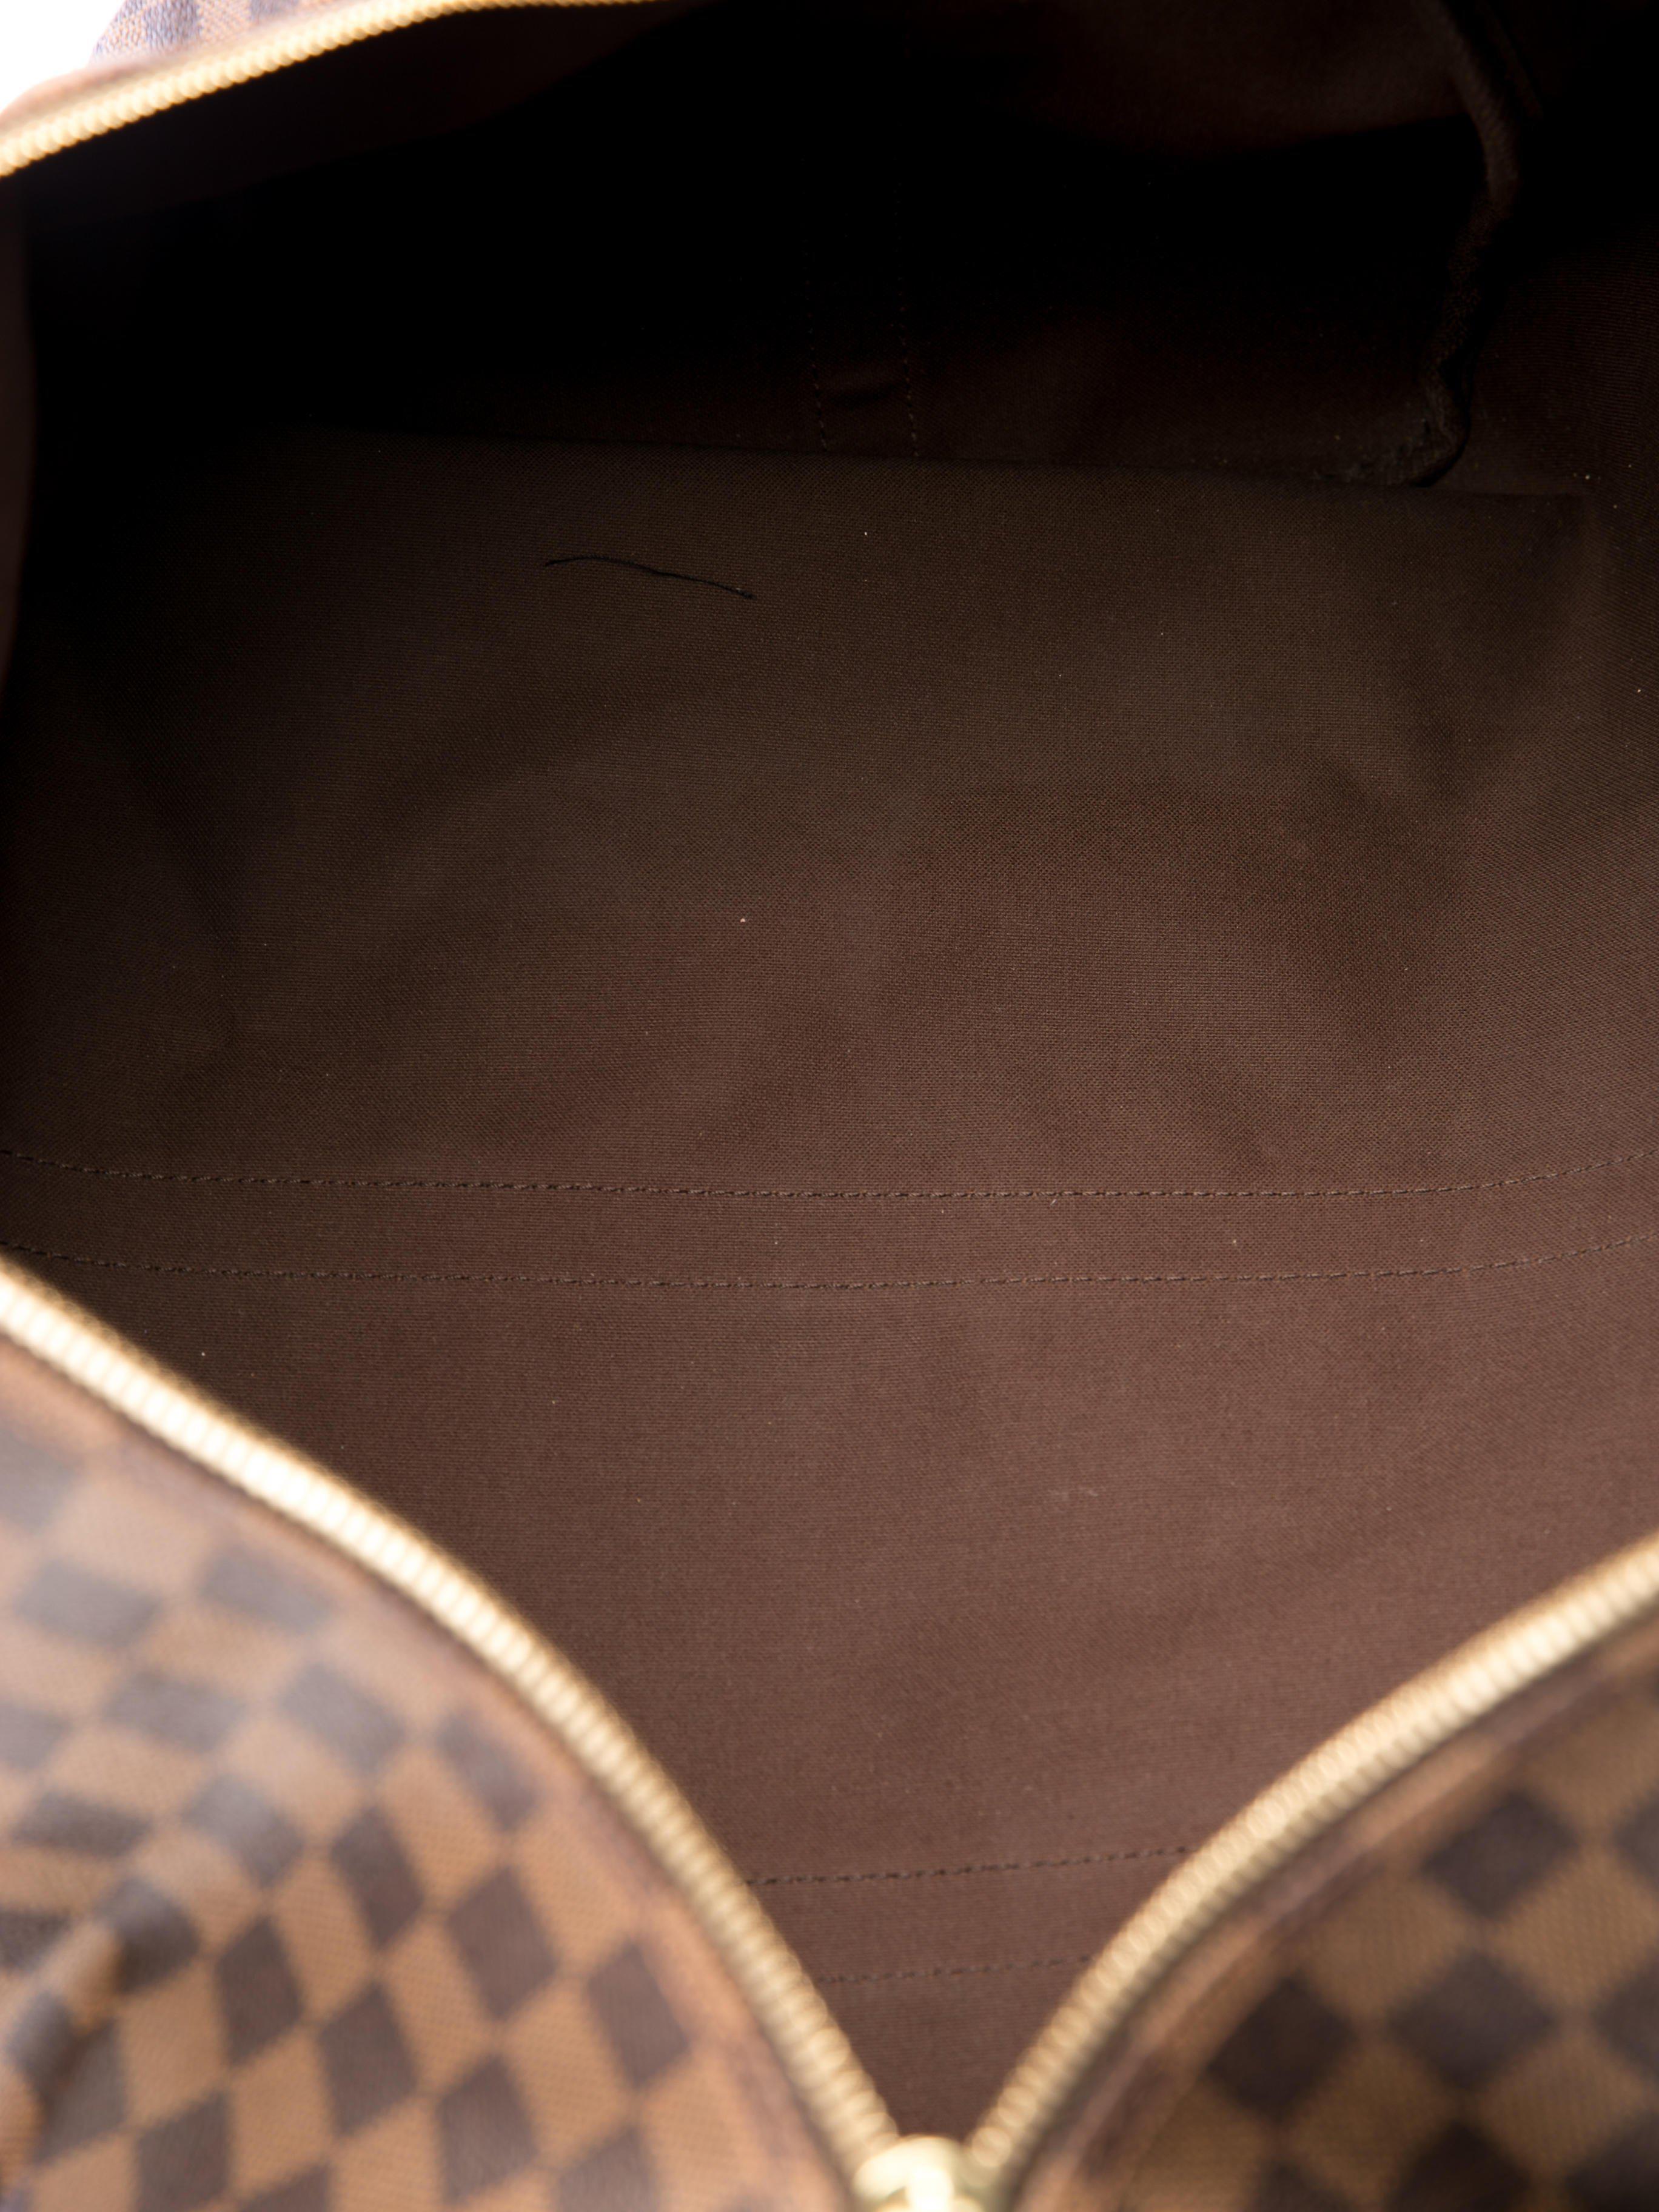 2f1c1709c0aa Louis Vuitton Damier Ebene Keepall 55 Duffle Bag